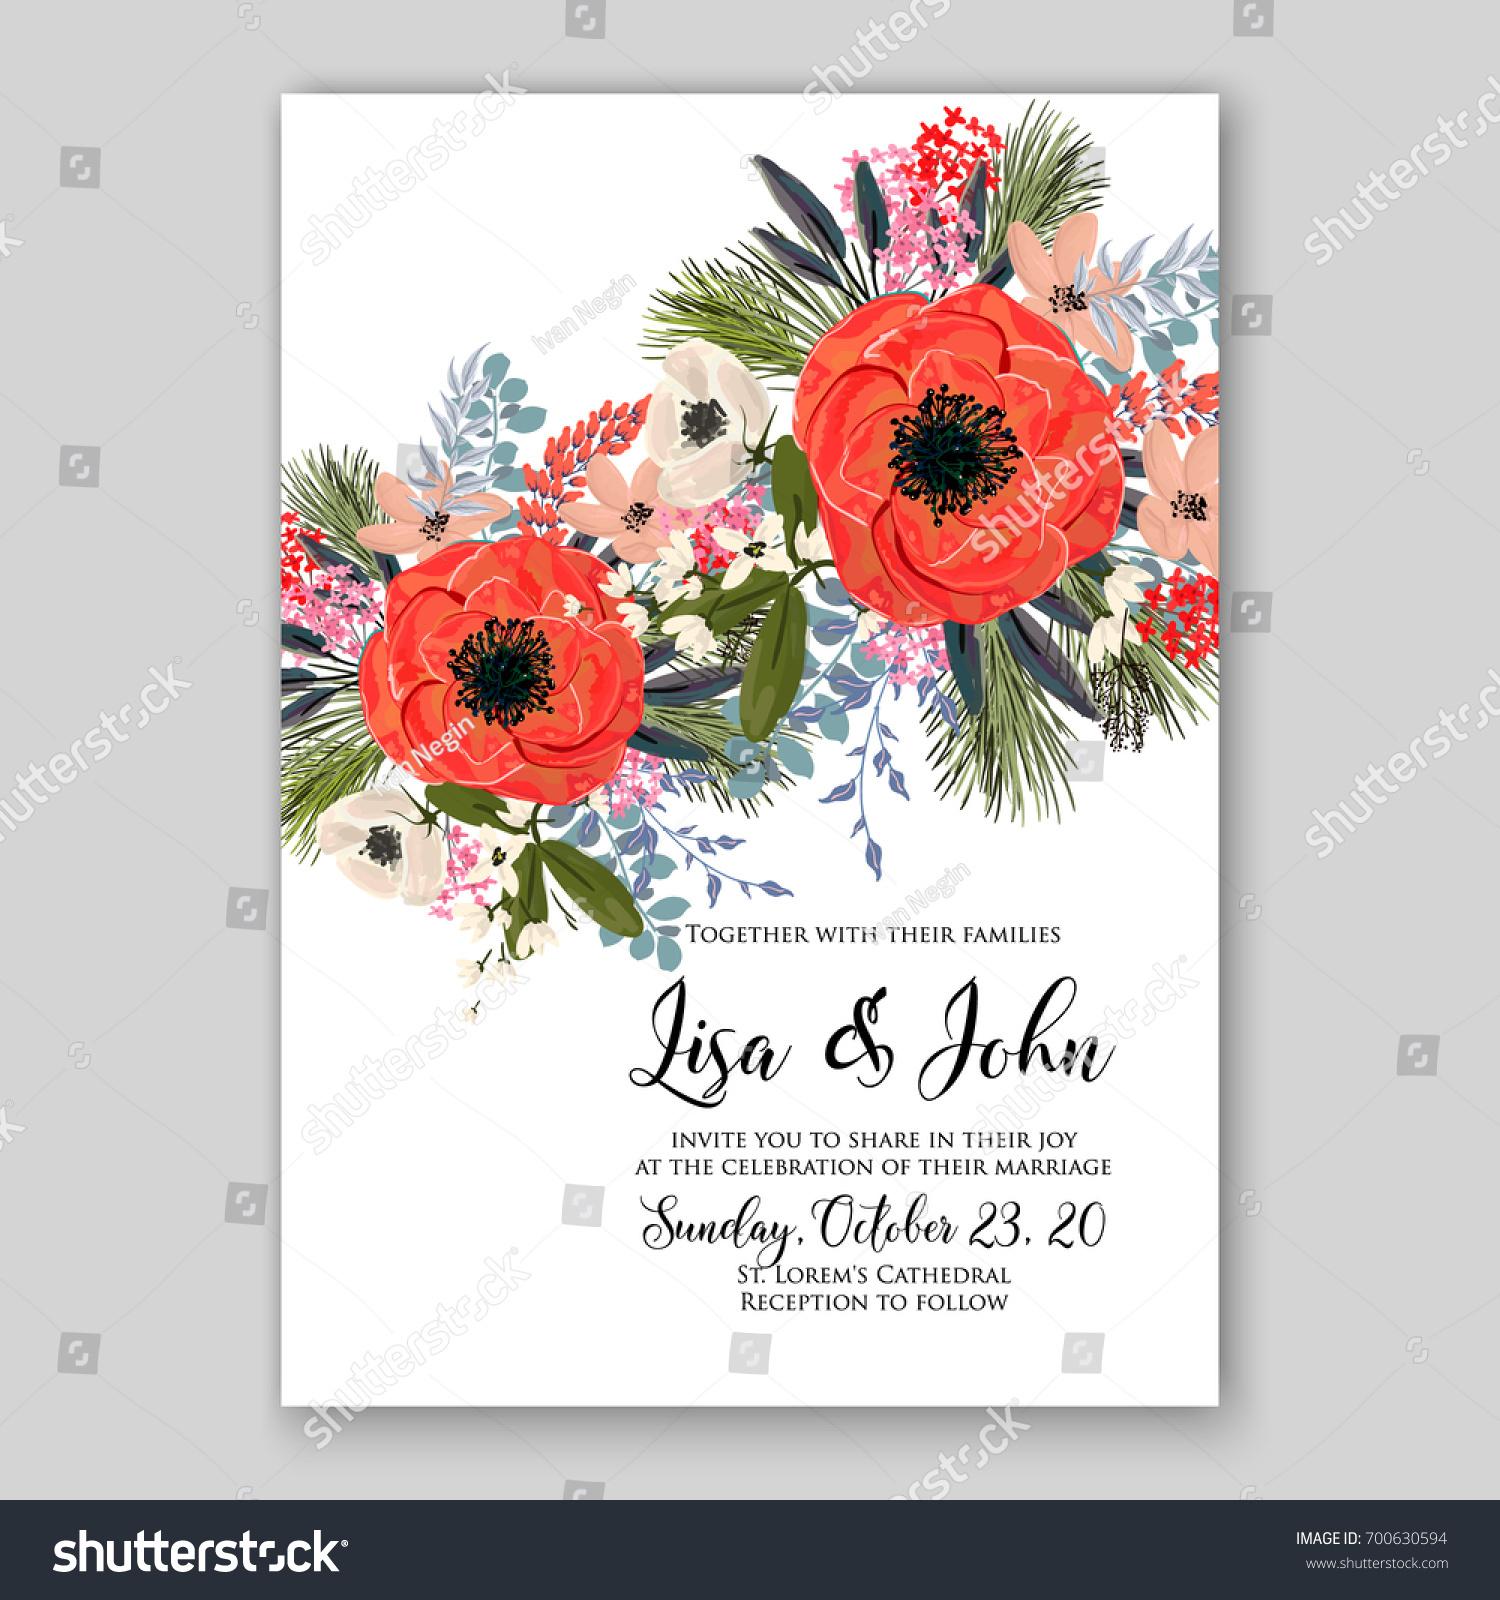 Wedding Invitation Template Floral Ornament Peony Stock Vector ...